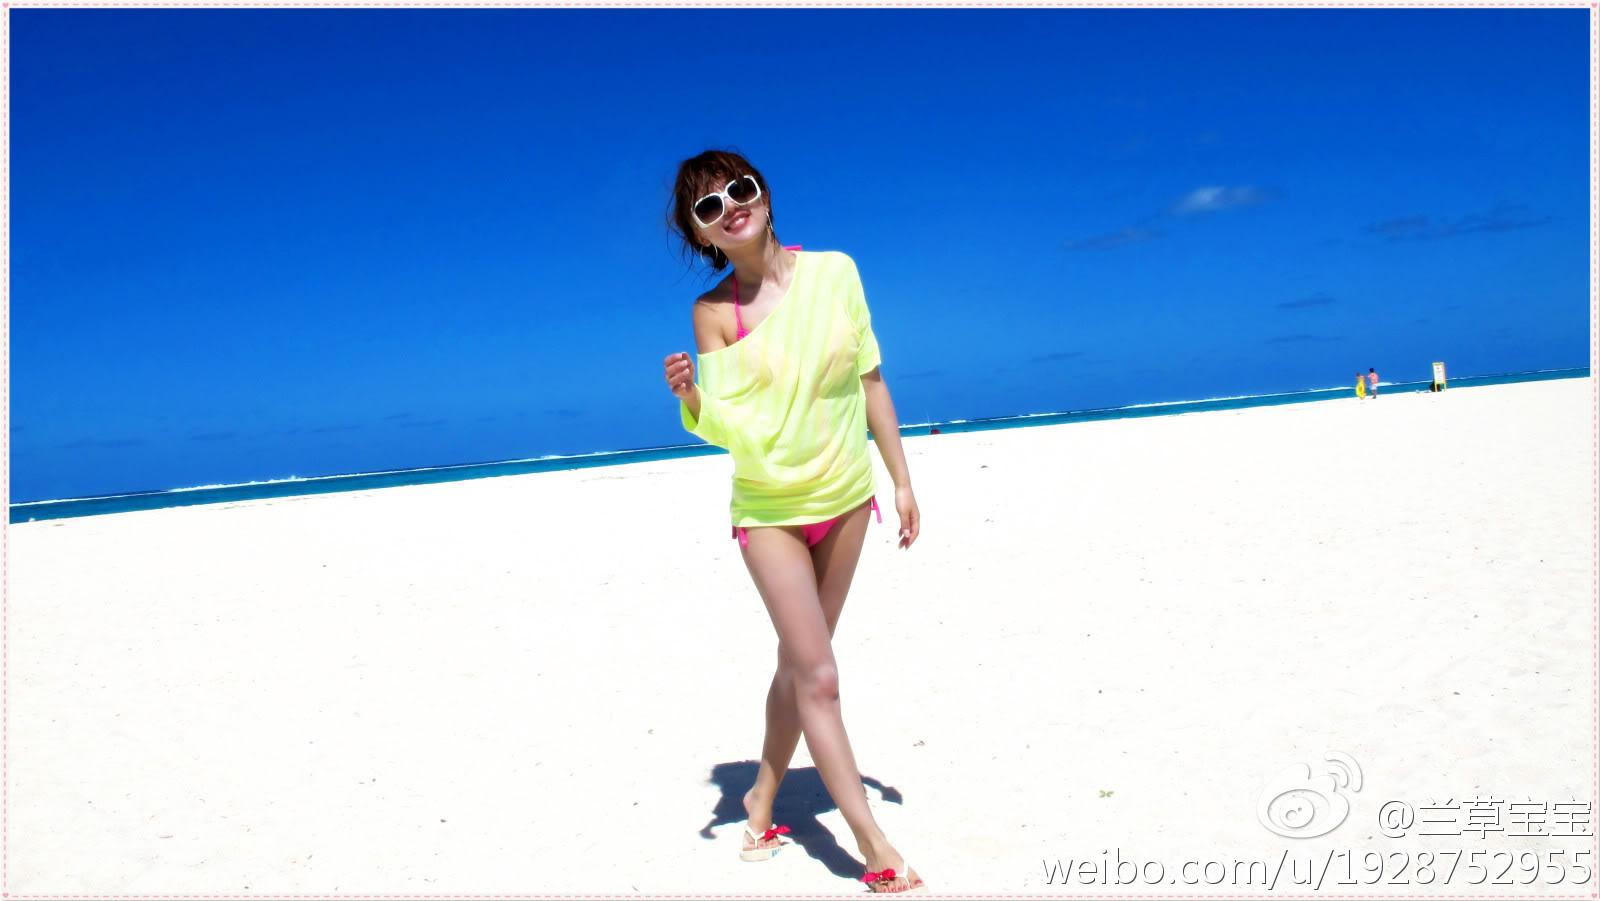 alan's Weibo/Twitter Thread 72f66f3bjw1dpklzdp5e4j